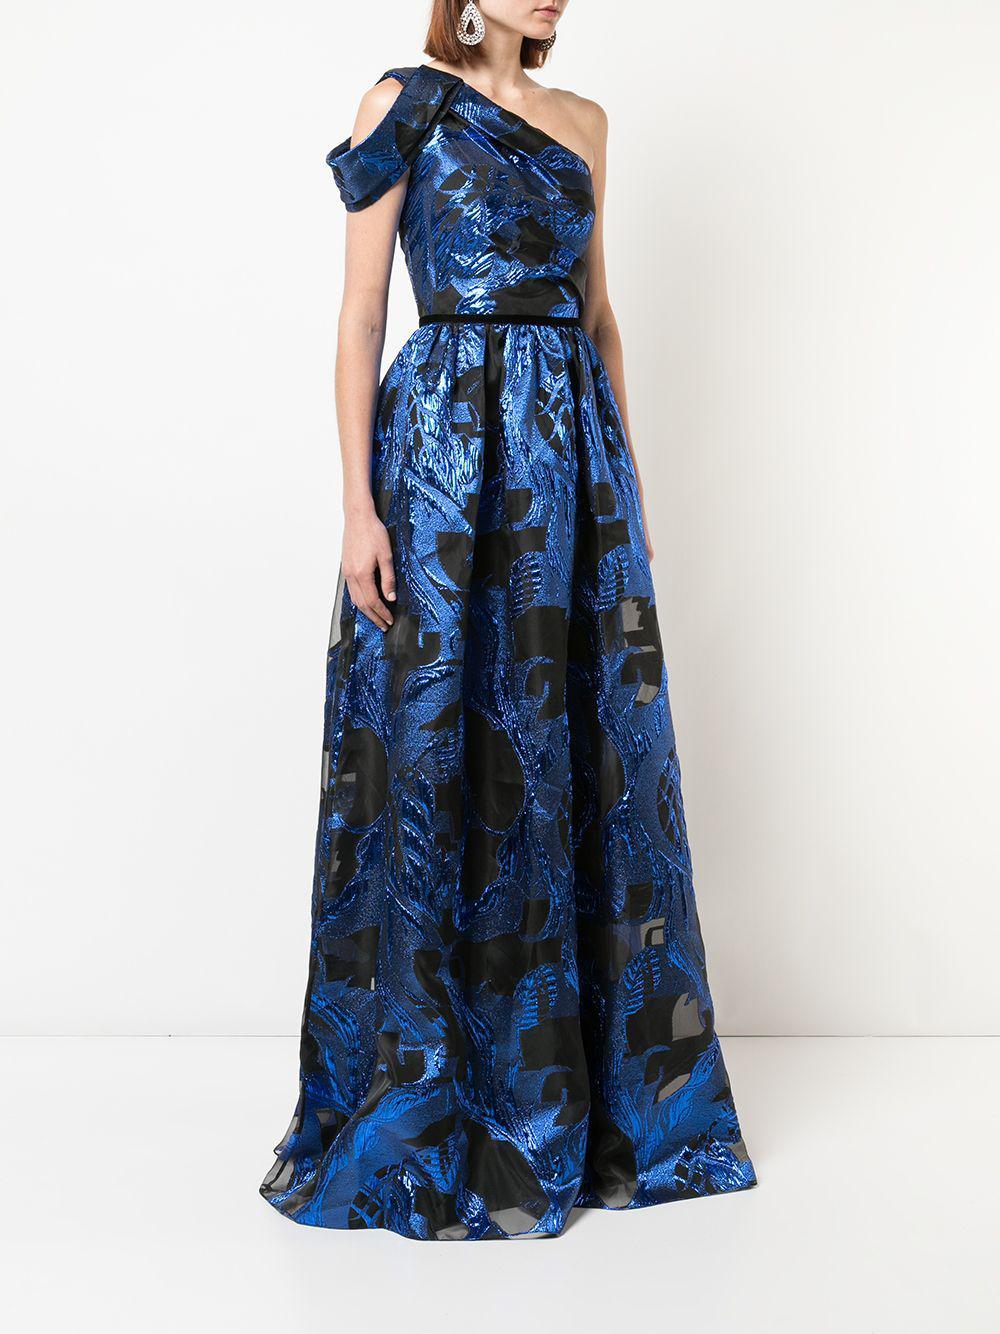 a99baf89 Marchesa notte - Blue One Shoulder Metallic Fils Coupe Gown - Lyst. View  fullscreen